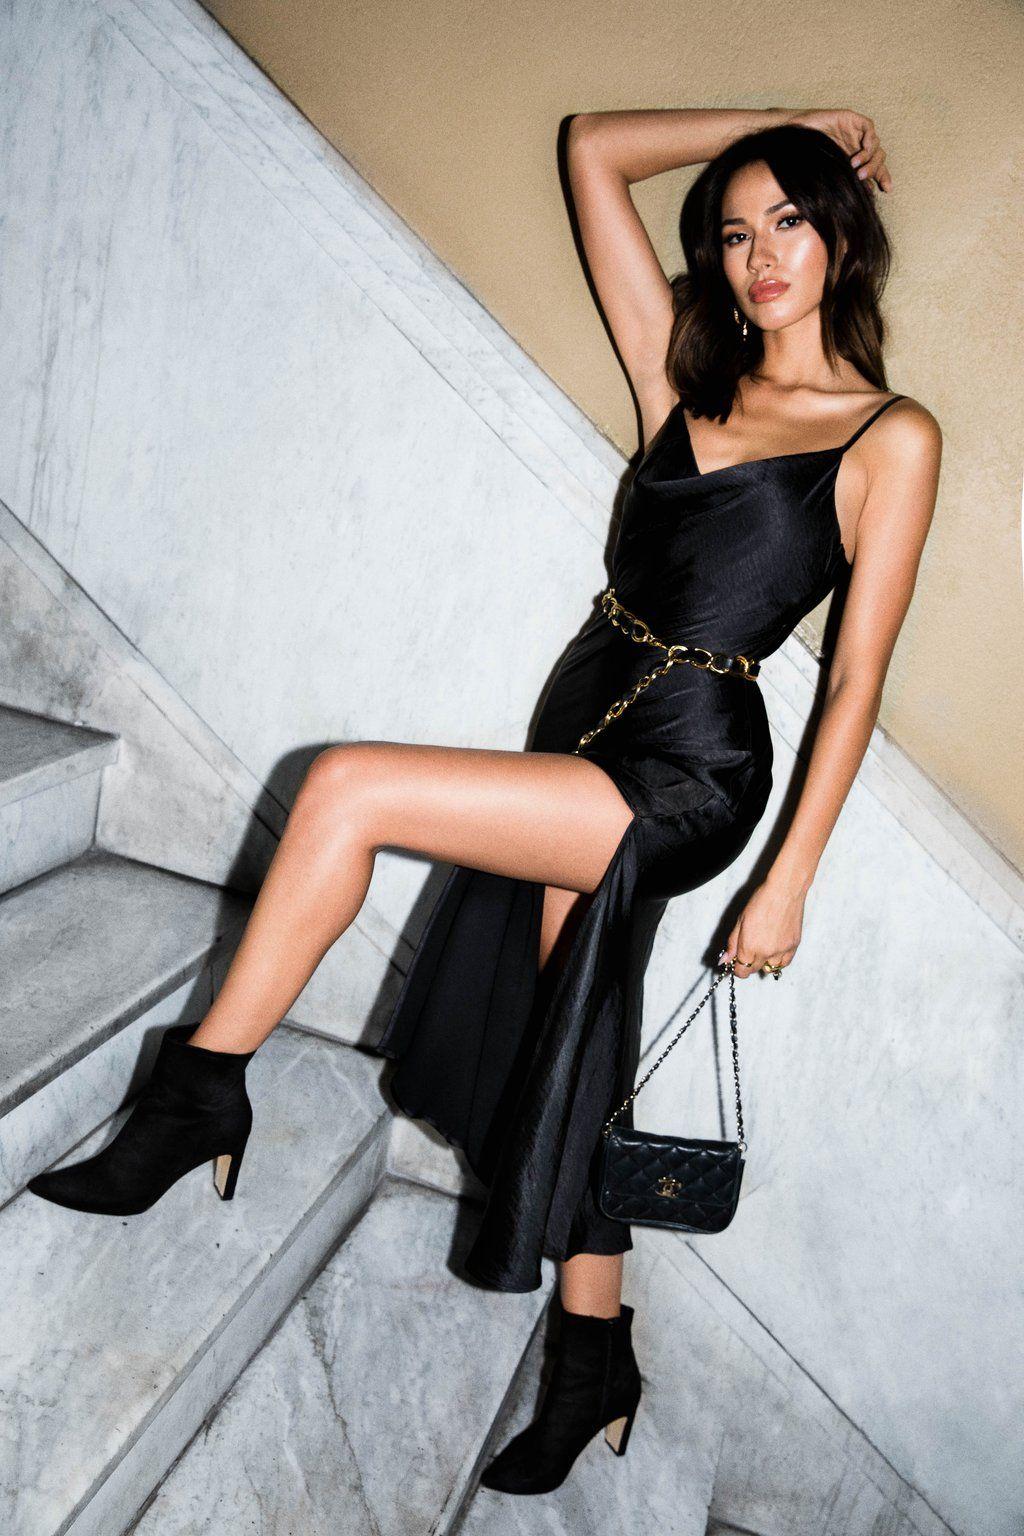 Frances Black Slip Dress 12th Tribe Slip Dress Outfit Black Slip Dress Black Slip Dress Outfit [ 1536 x 1024 Pixel ]